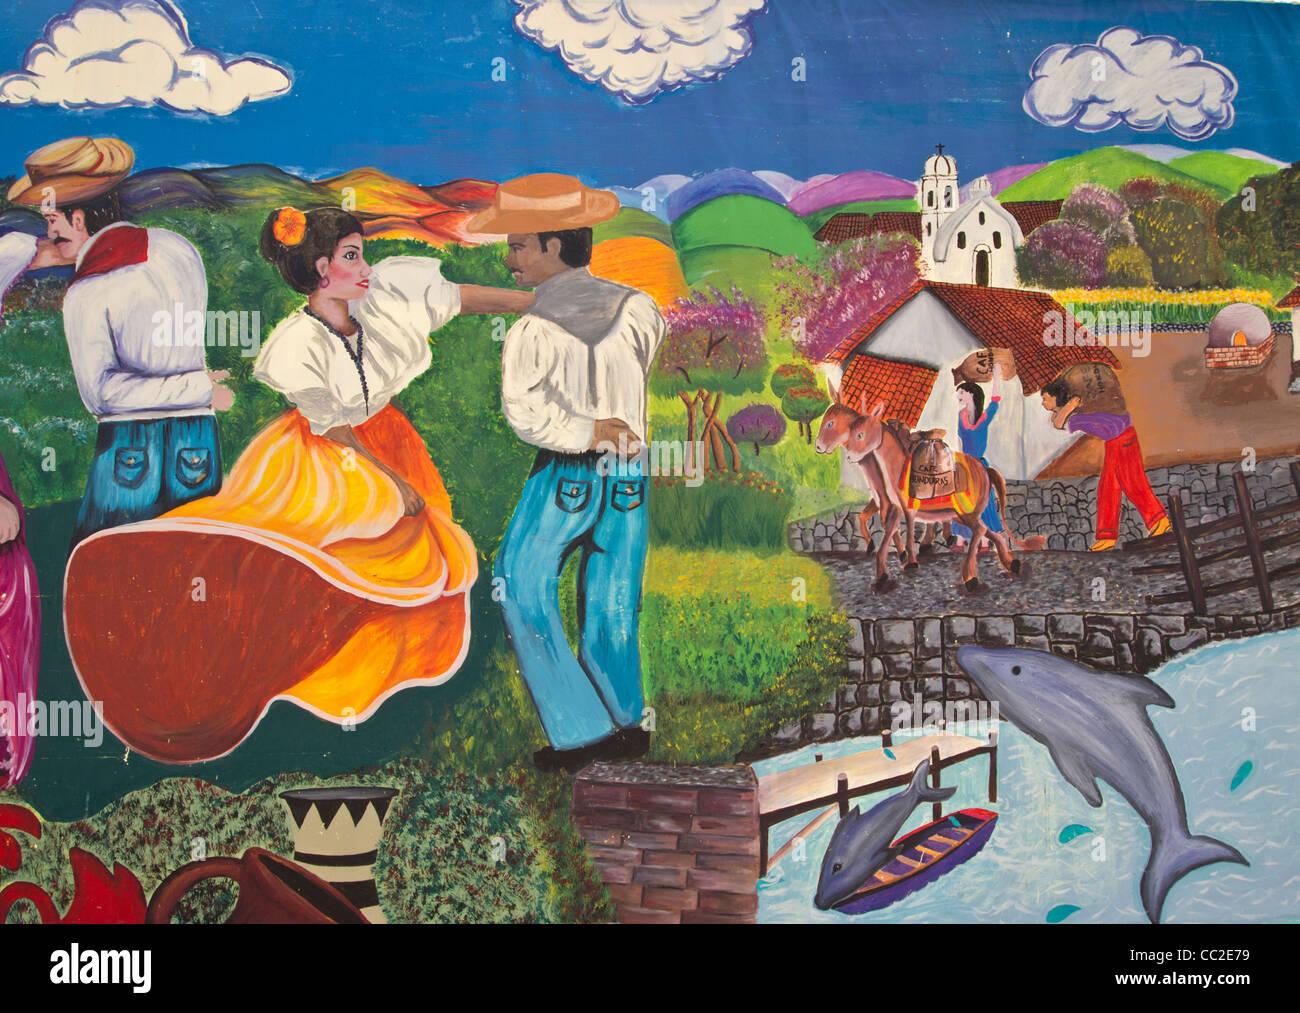 Mural of people dancing in Honduras - Stock Image